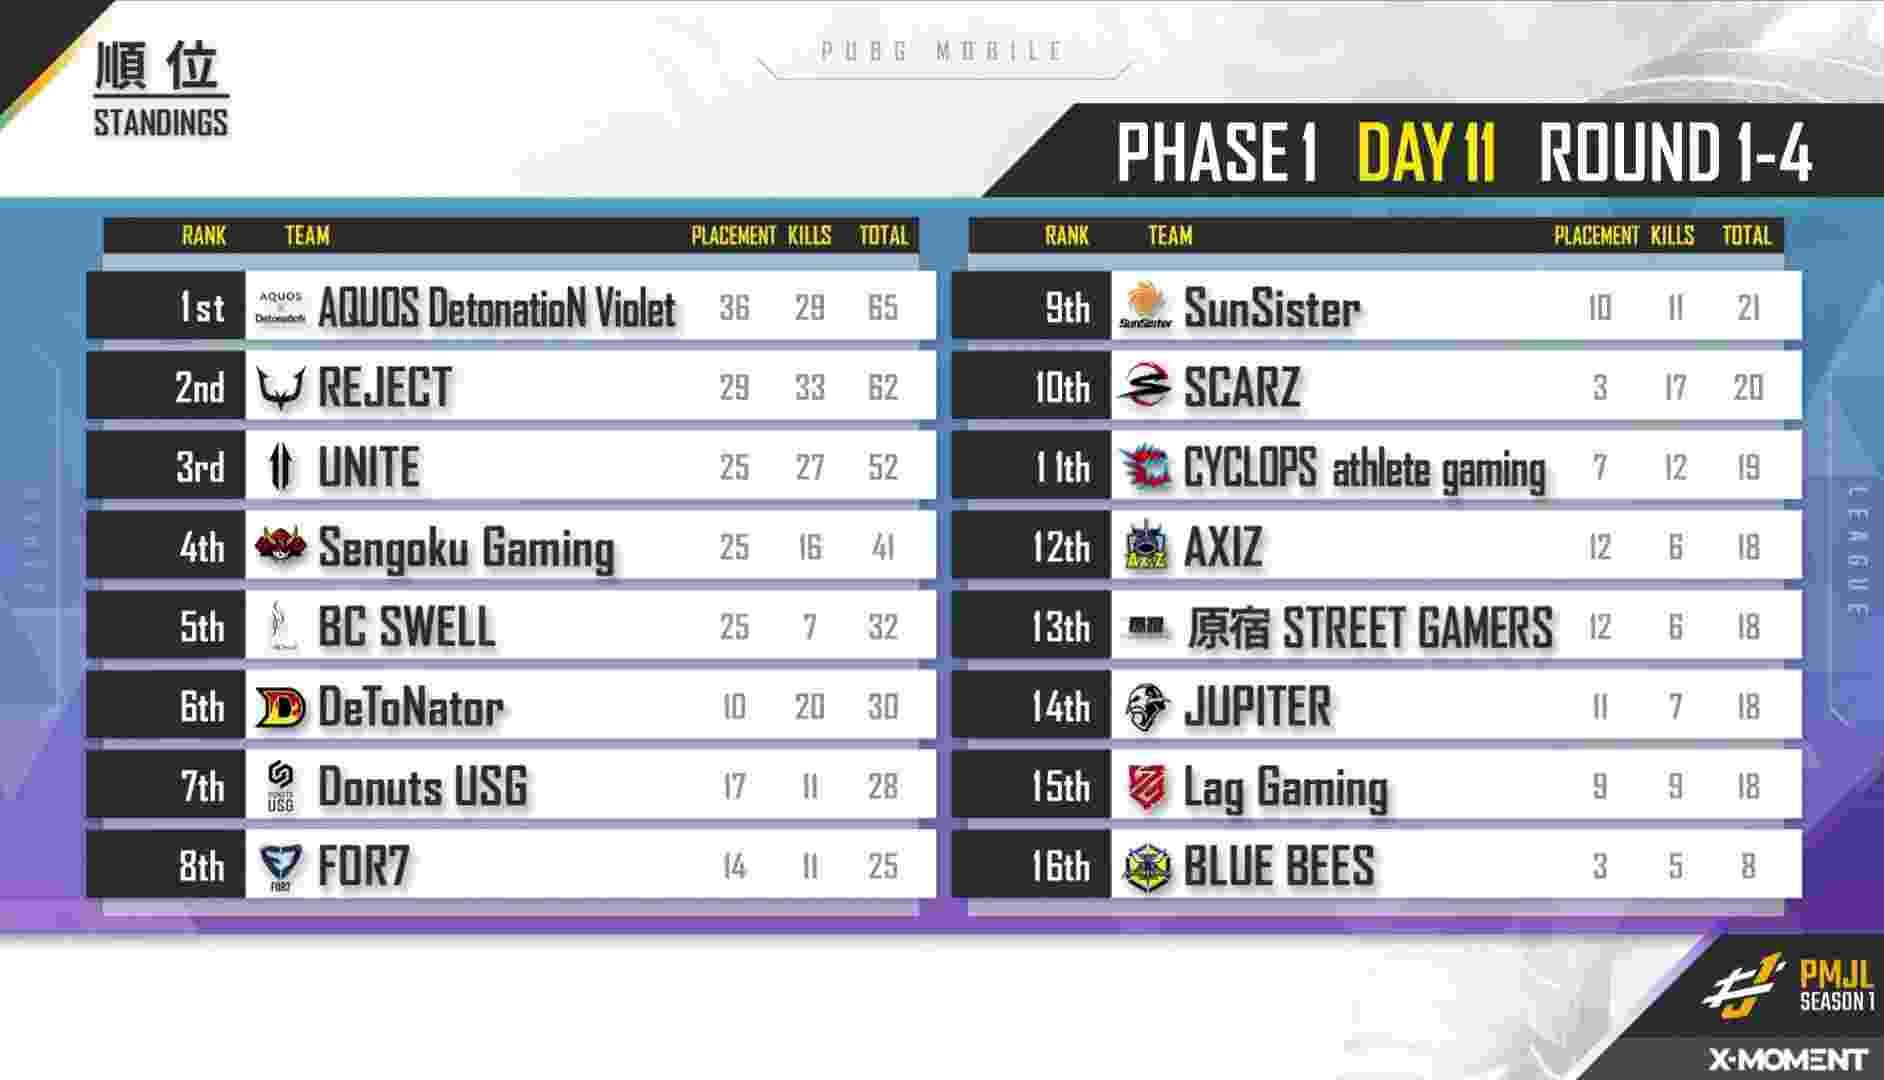 PMJL Season 1 Phase 1 Day 11 Standings